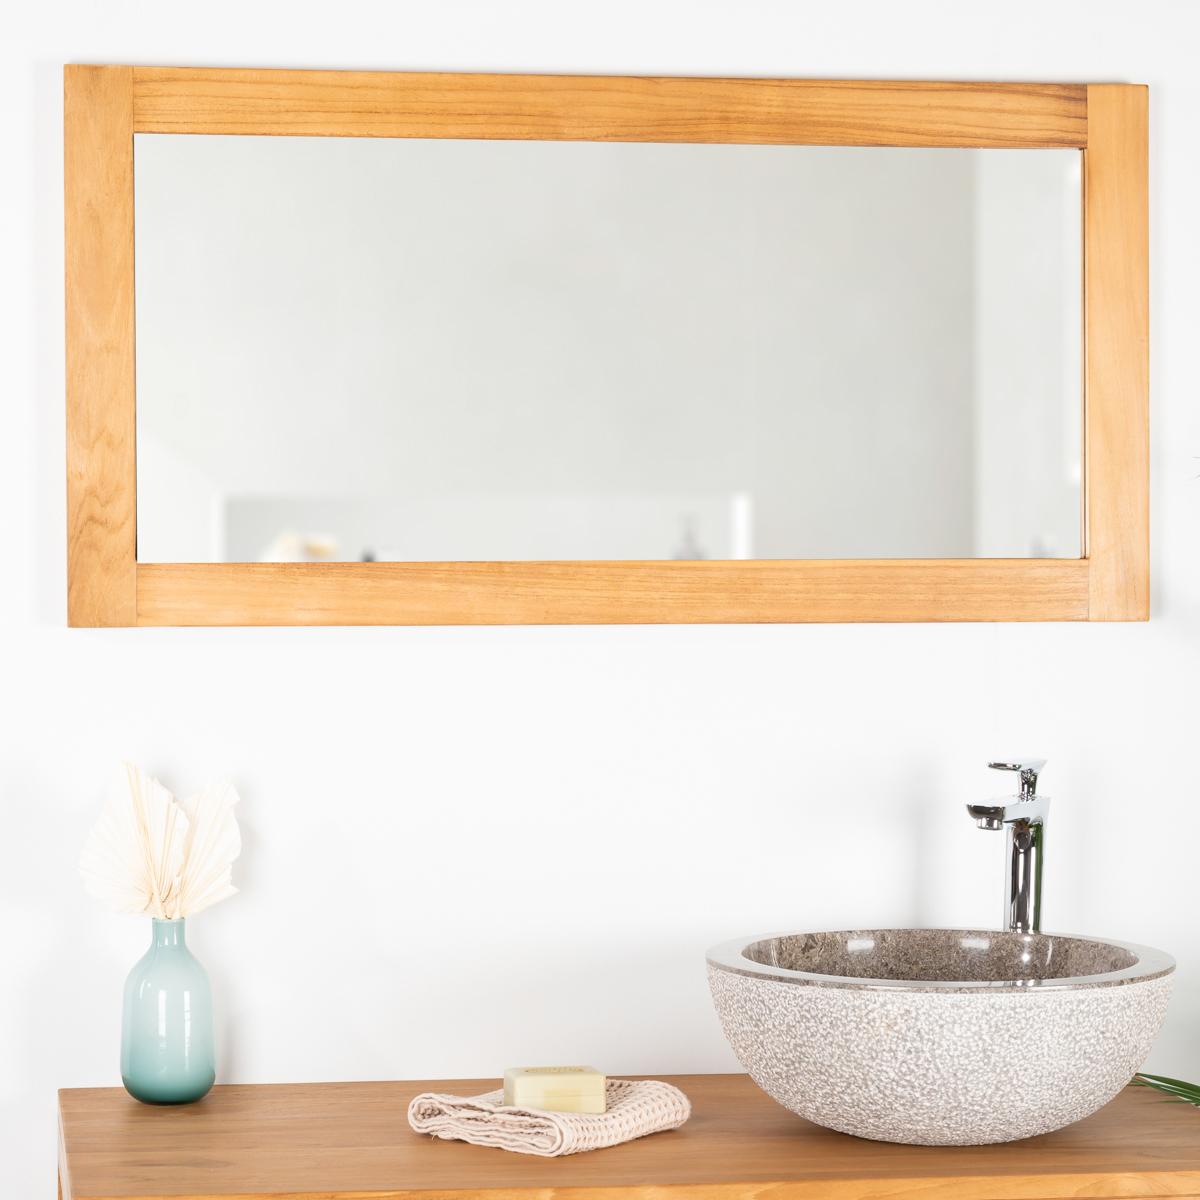 Espejo cuarto de ba o 100 x 50 for Wohnzimmertisch 100 x 50